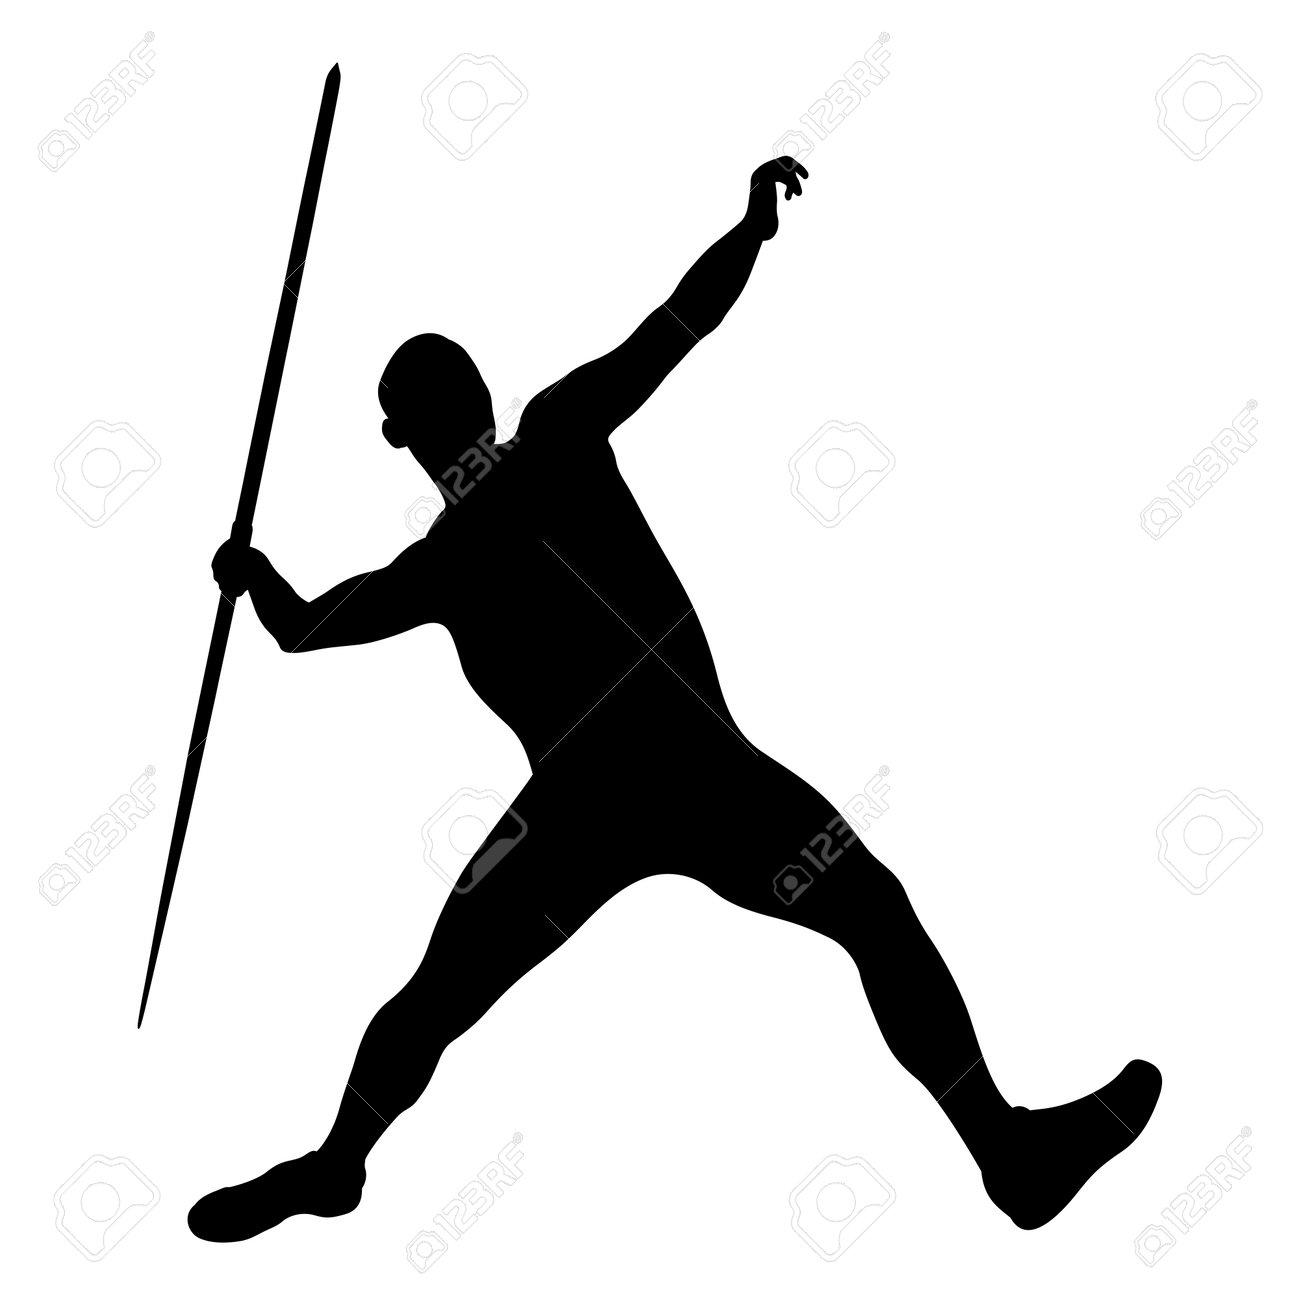 javelin throw male athlete black silhouette - 172283910